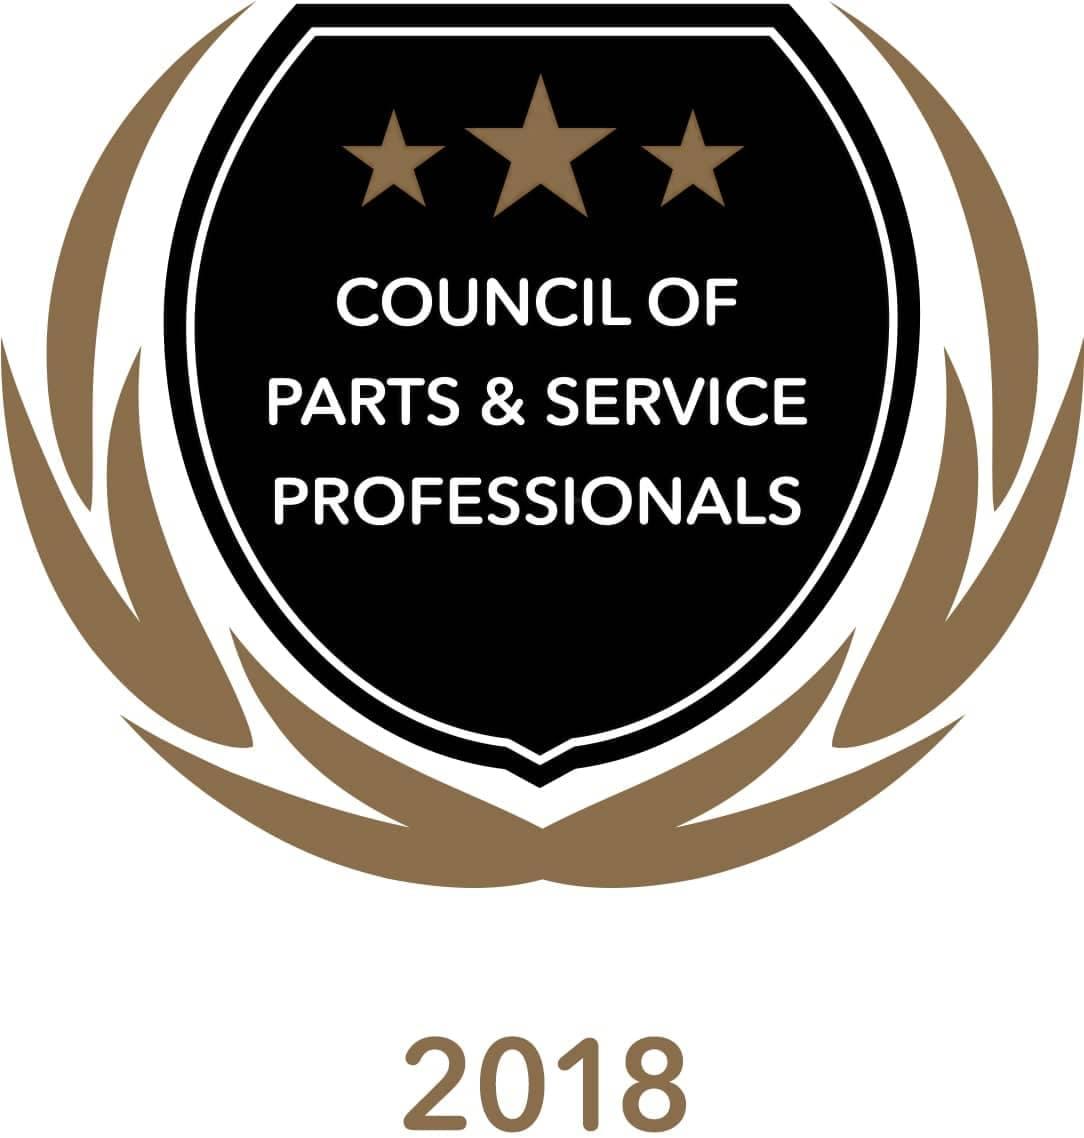 Council of Parts & Service Professionals